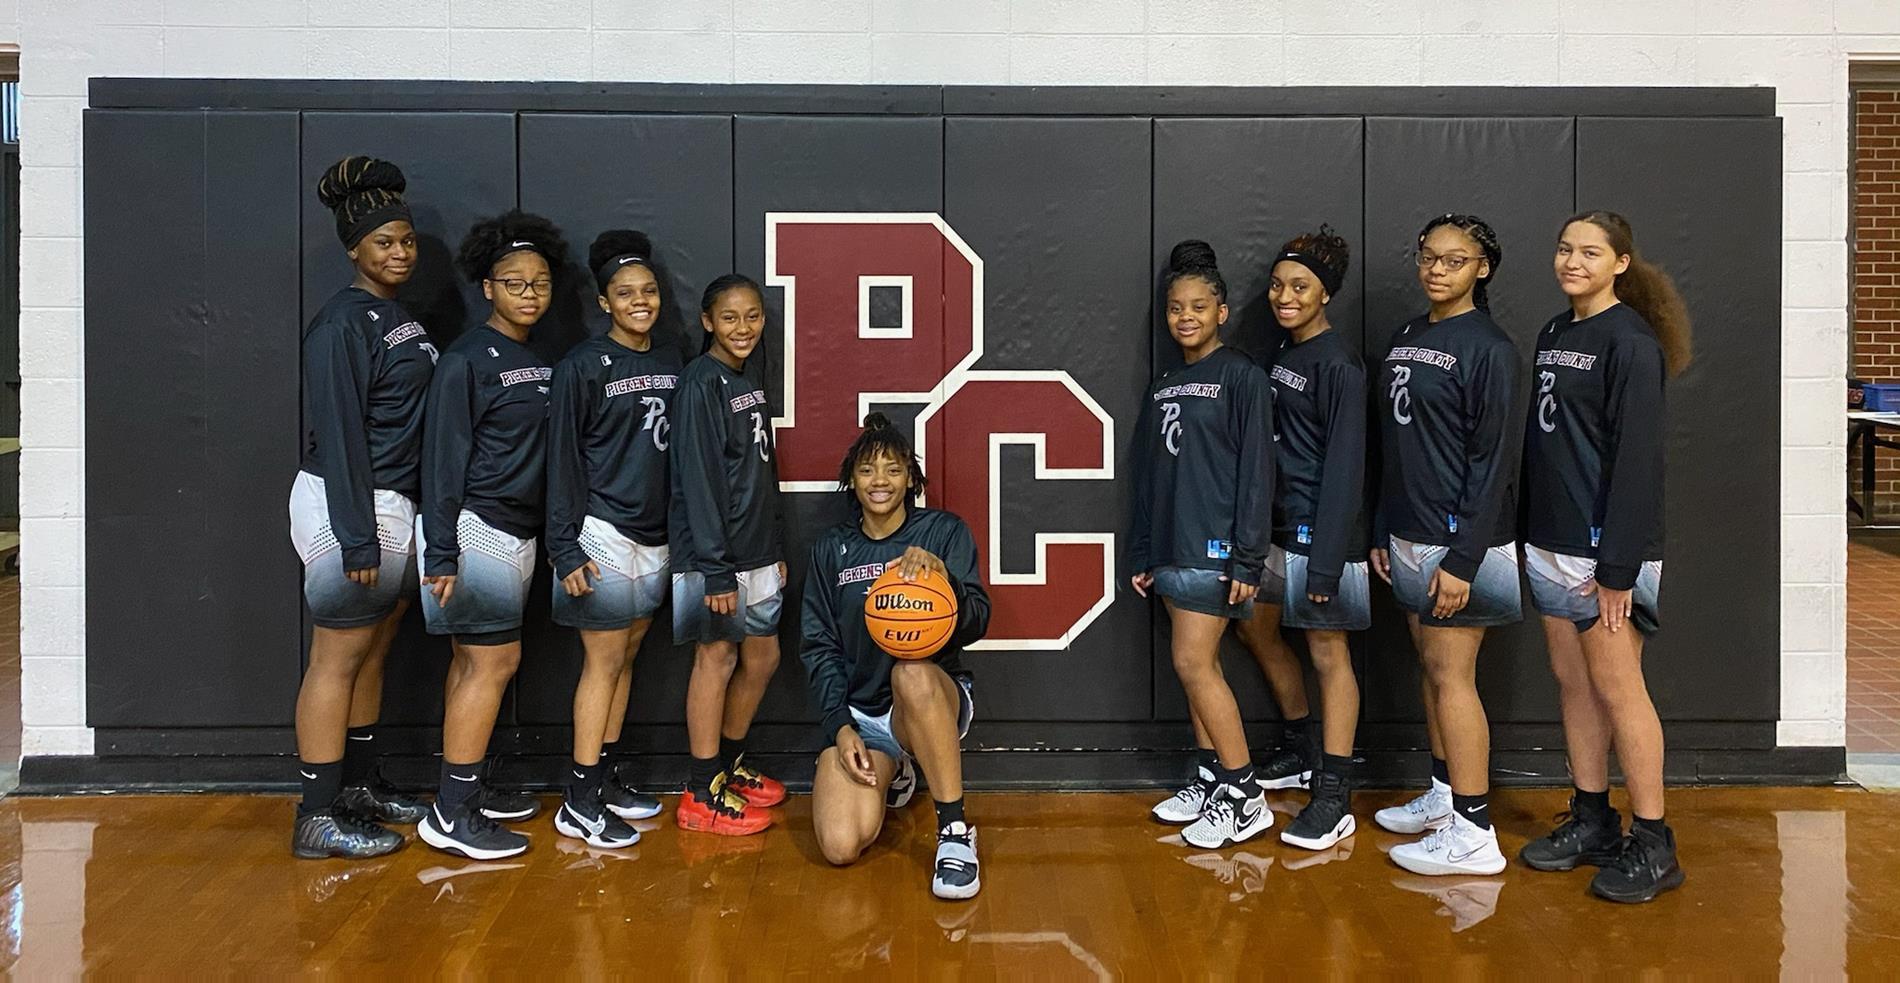 2020 Girls Varsity Basketball Team